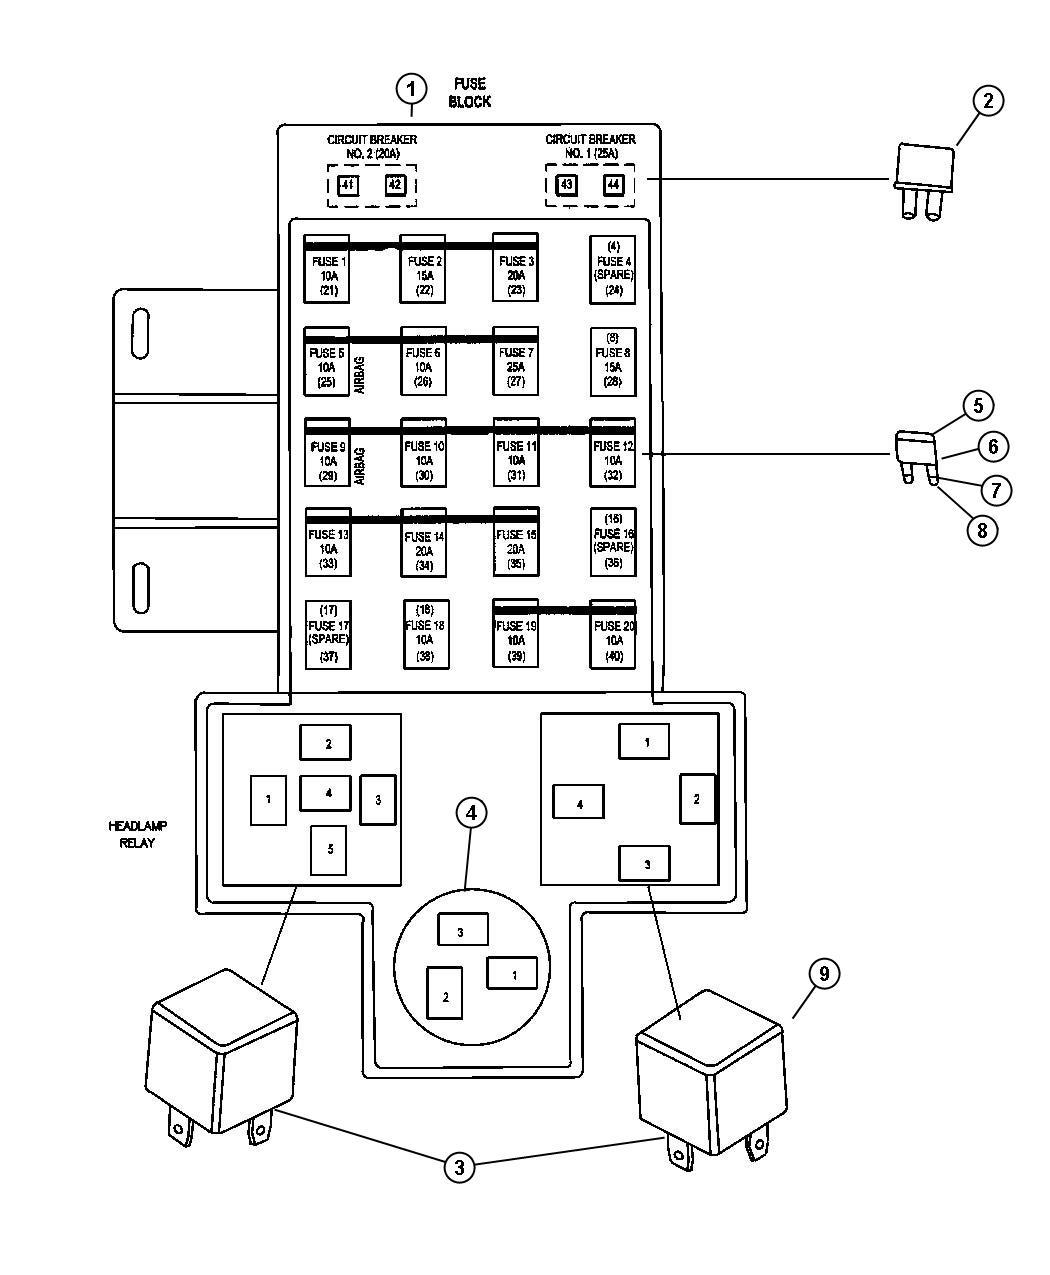 C5 Stereo Wiring Diagram? – Corvetteforum